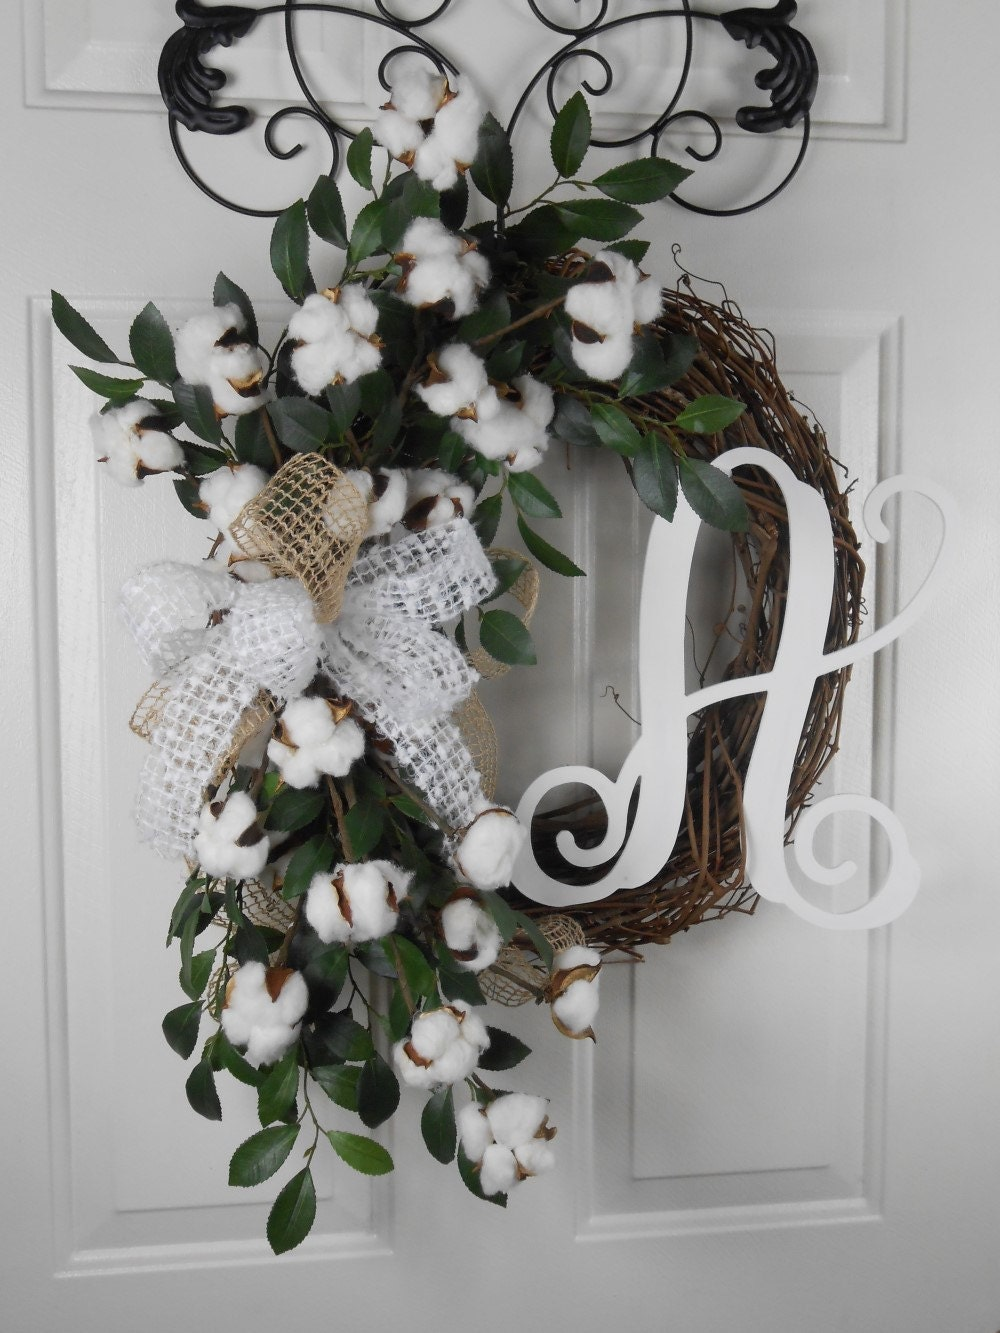 Southern Cotton Wreath Farmhouse Wreath Rustic Wreath